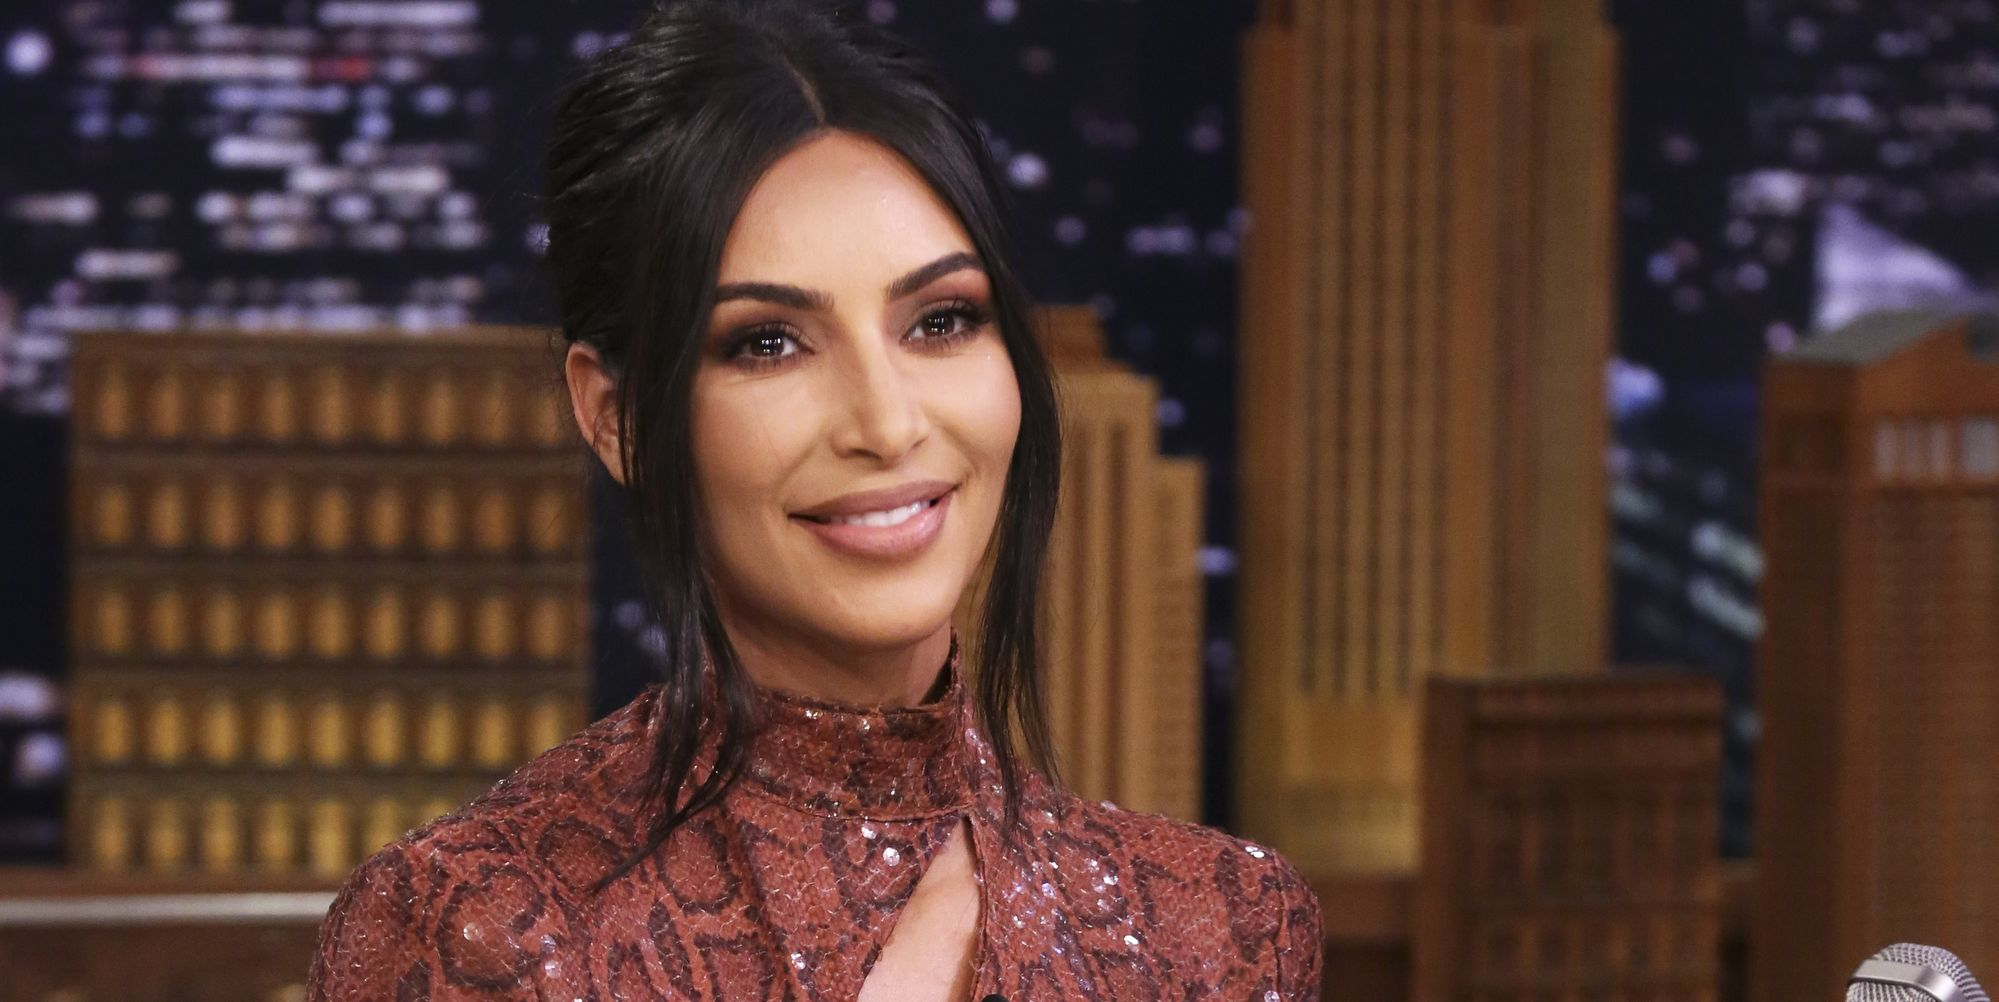 Fans Are Dragging Kim Kardashian Over Her Latest Instagram Post....